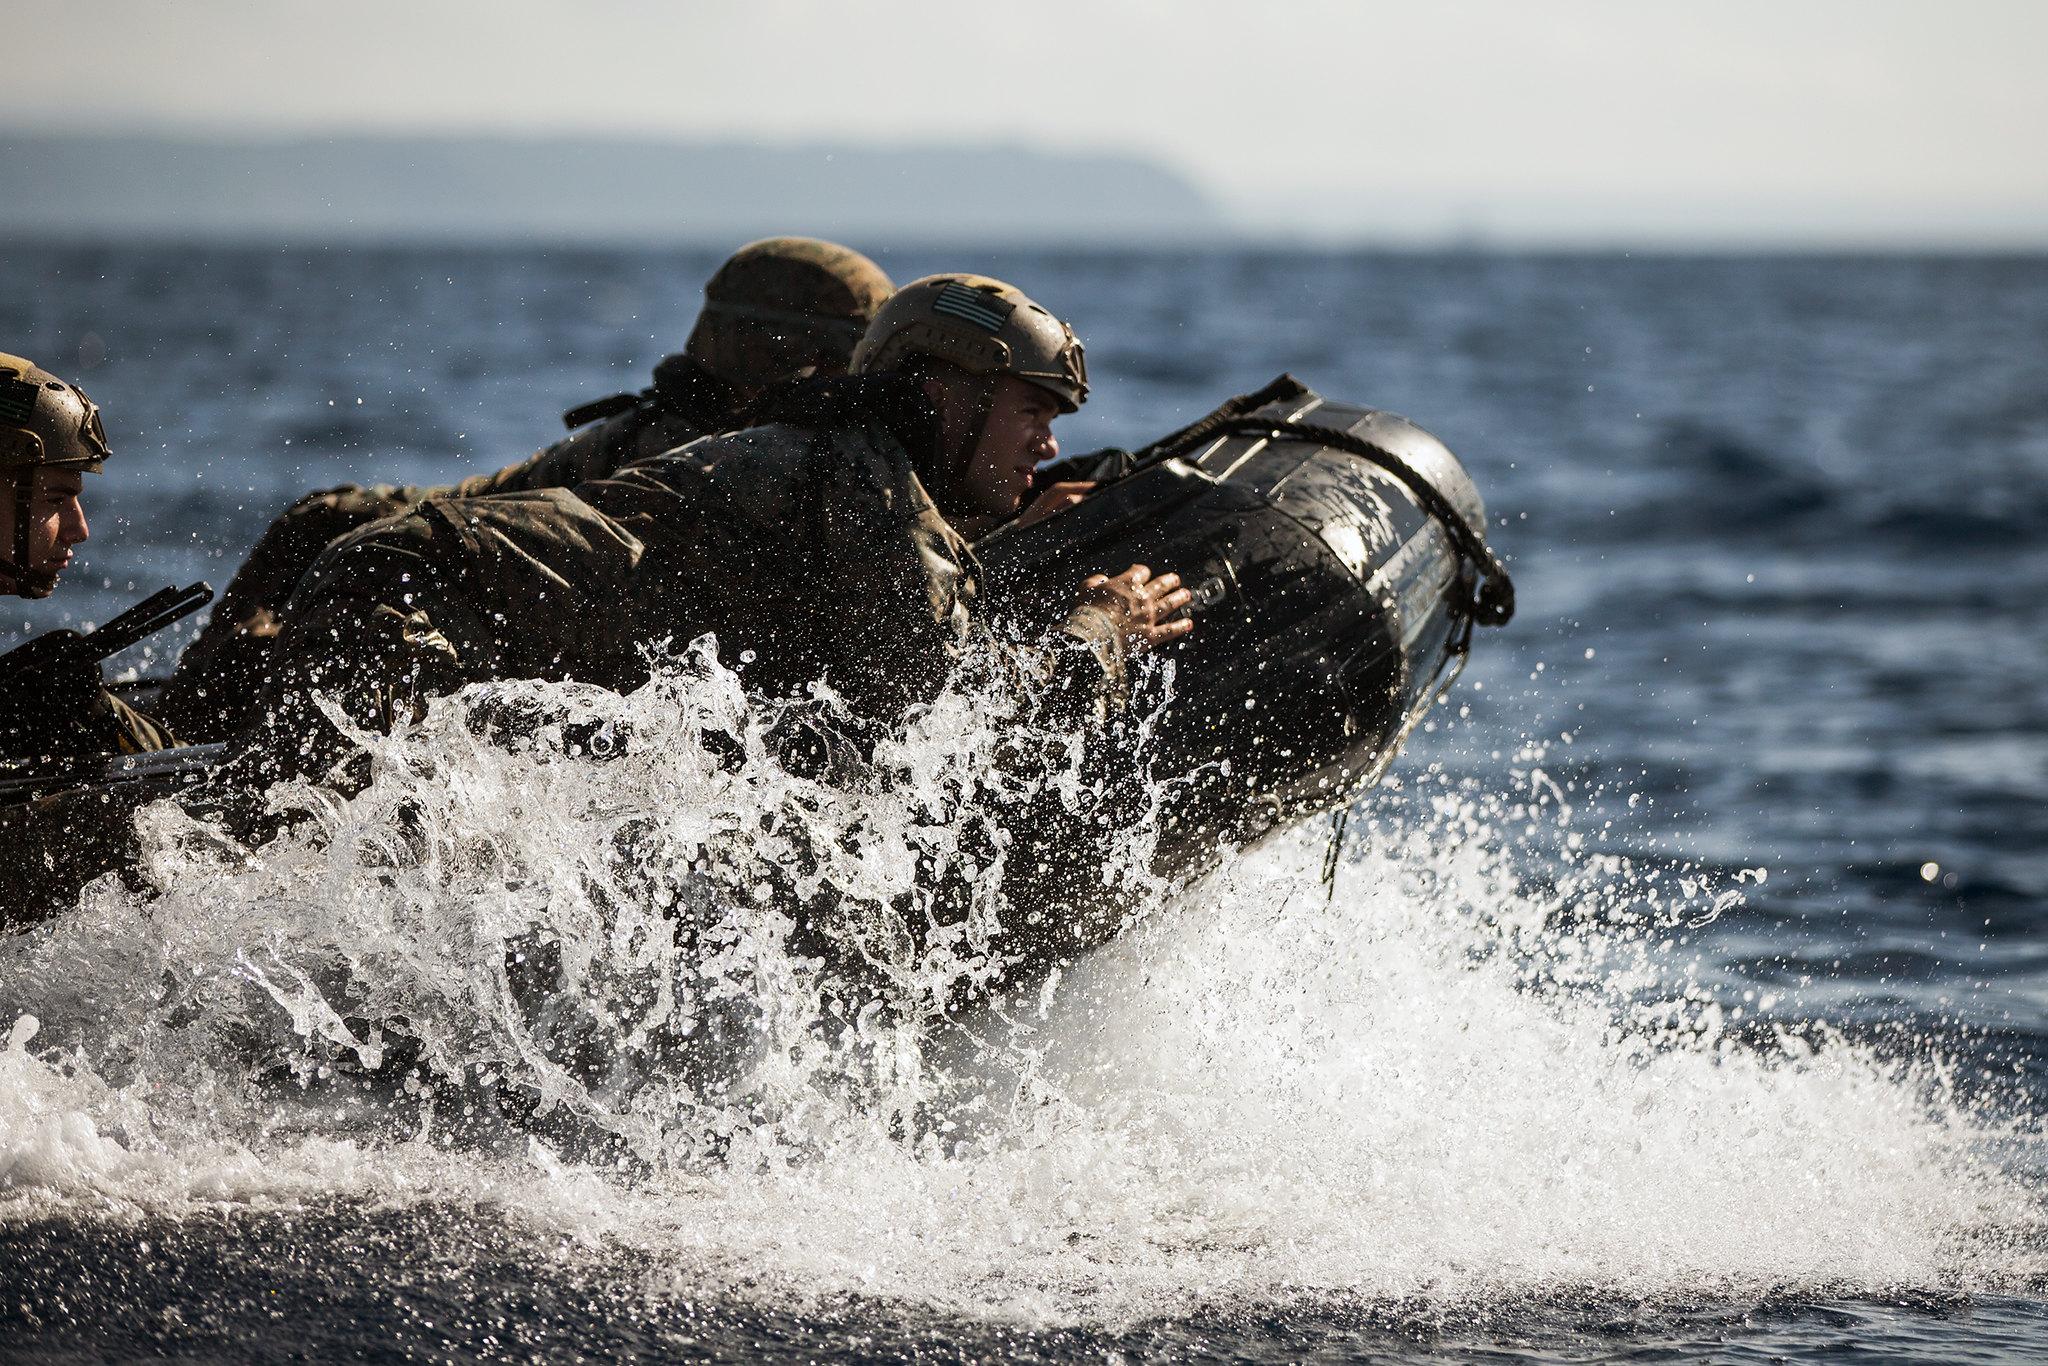 Marines conduct combat rubber raiding craft training on Camp Schwab, Okinawa, Japan, July 16, 2019. (Cpl. Josue Marquez/Marine Corps)